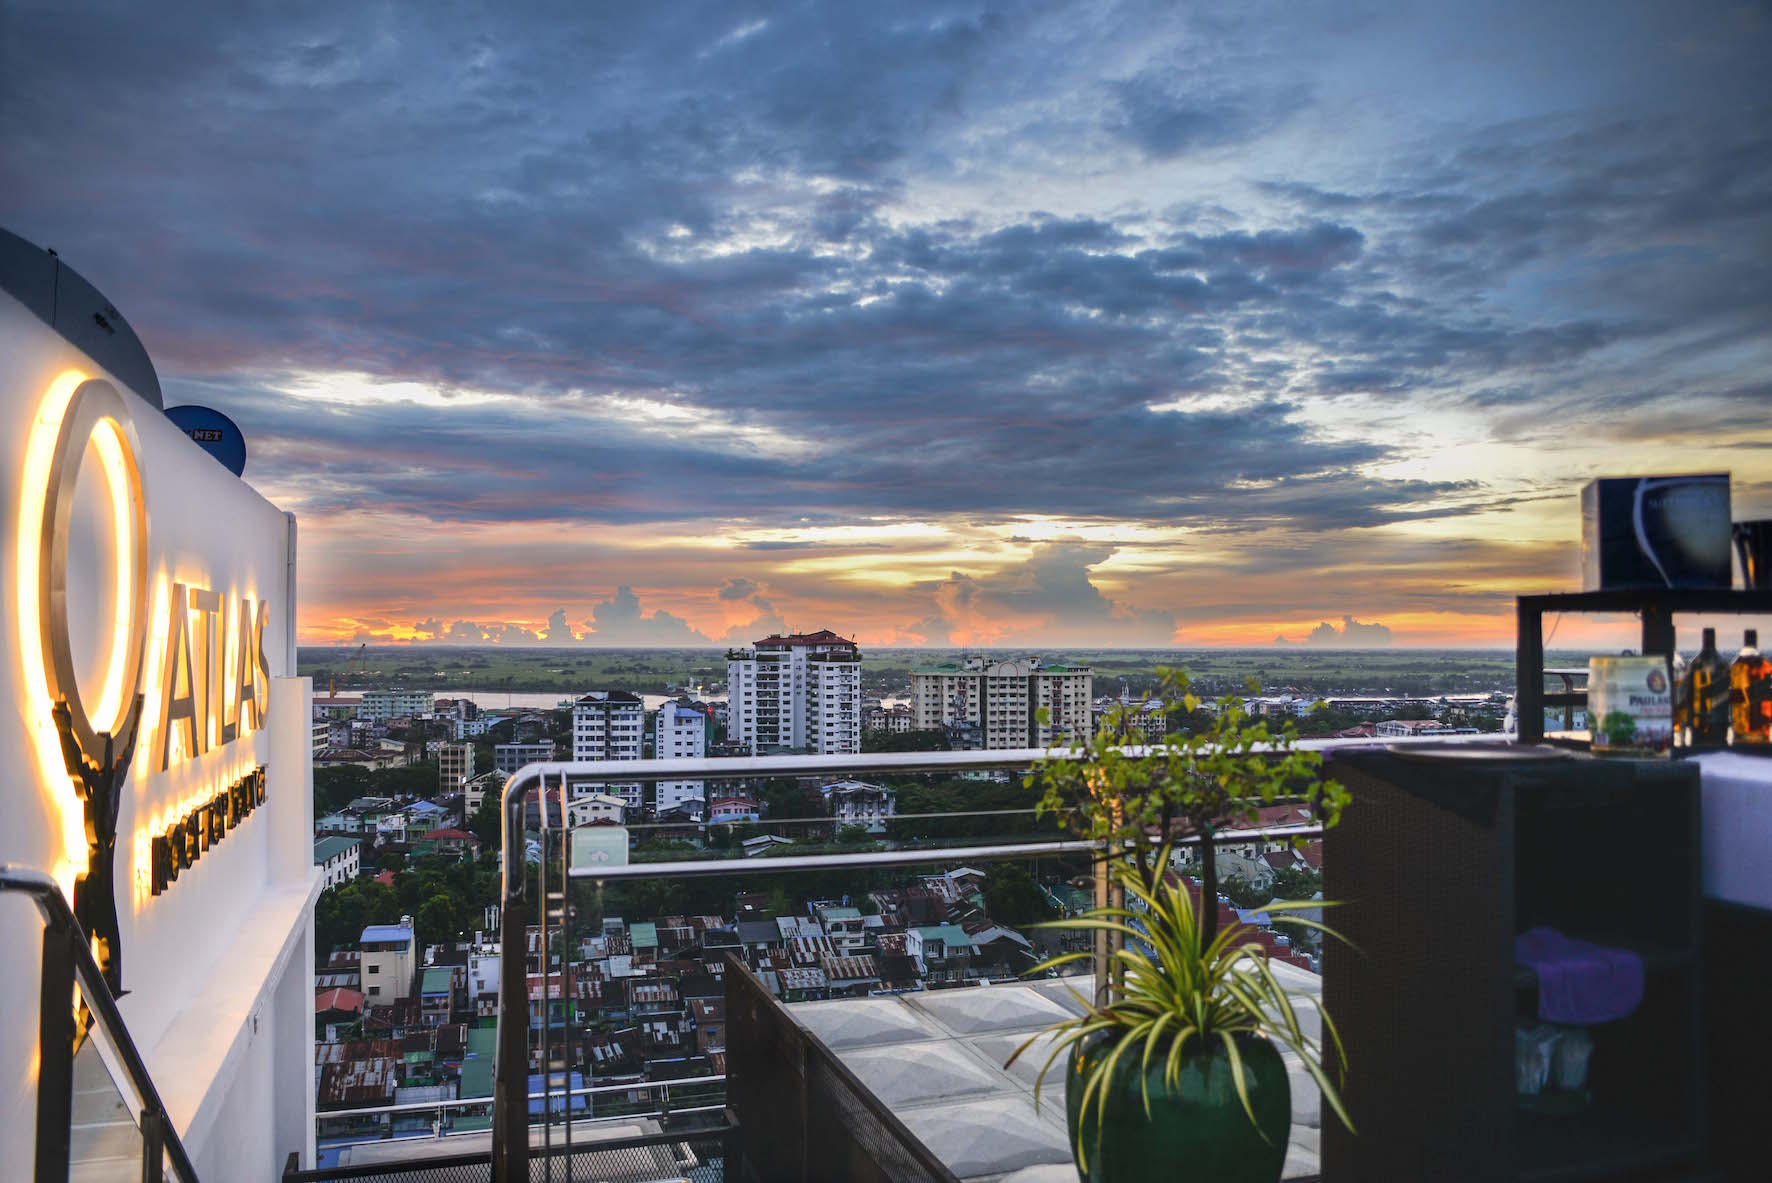 Daemmerung auf der Atlas Rooftop Bar in Yangon